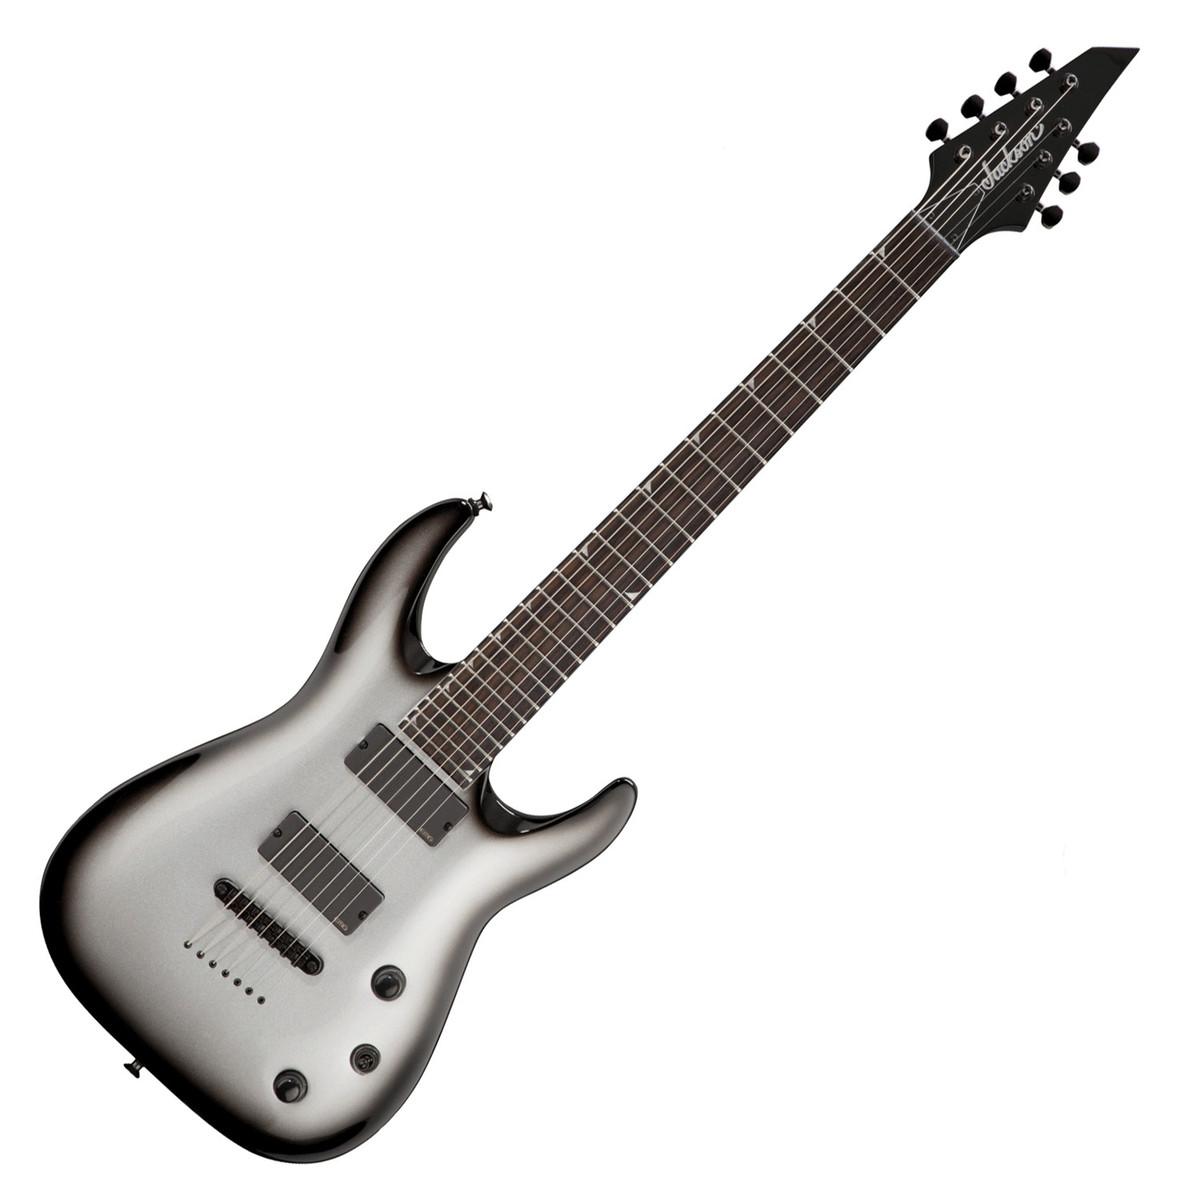 jackson x series slattxmg3 7 soloist 7 string guitar silverburst at. Black Bedroom Furniture Sets. Home Design Ideas